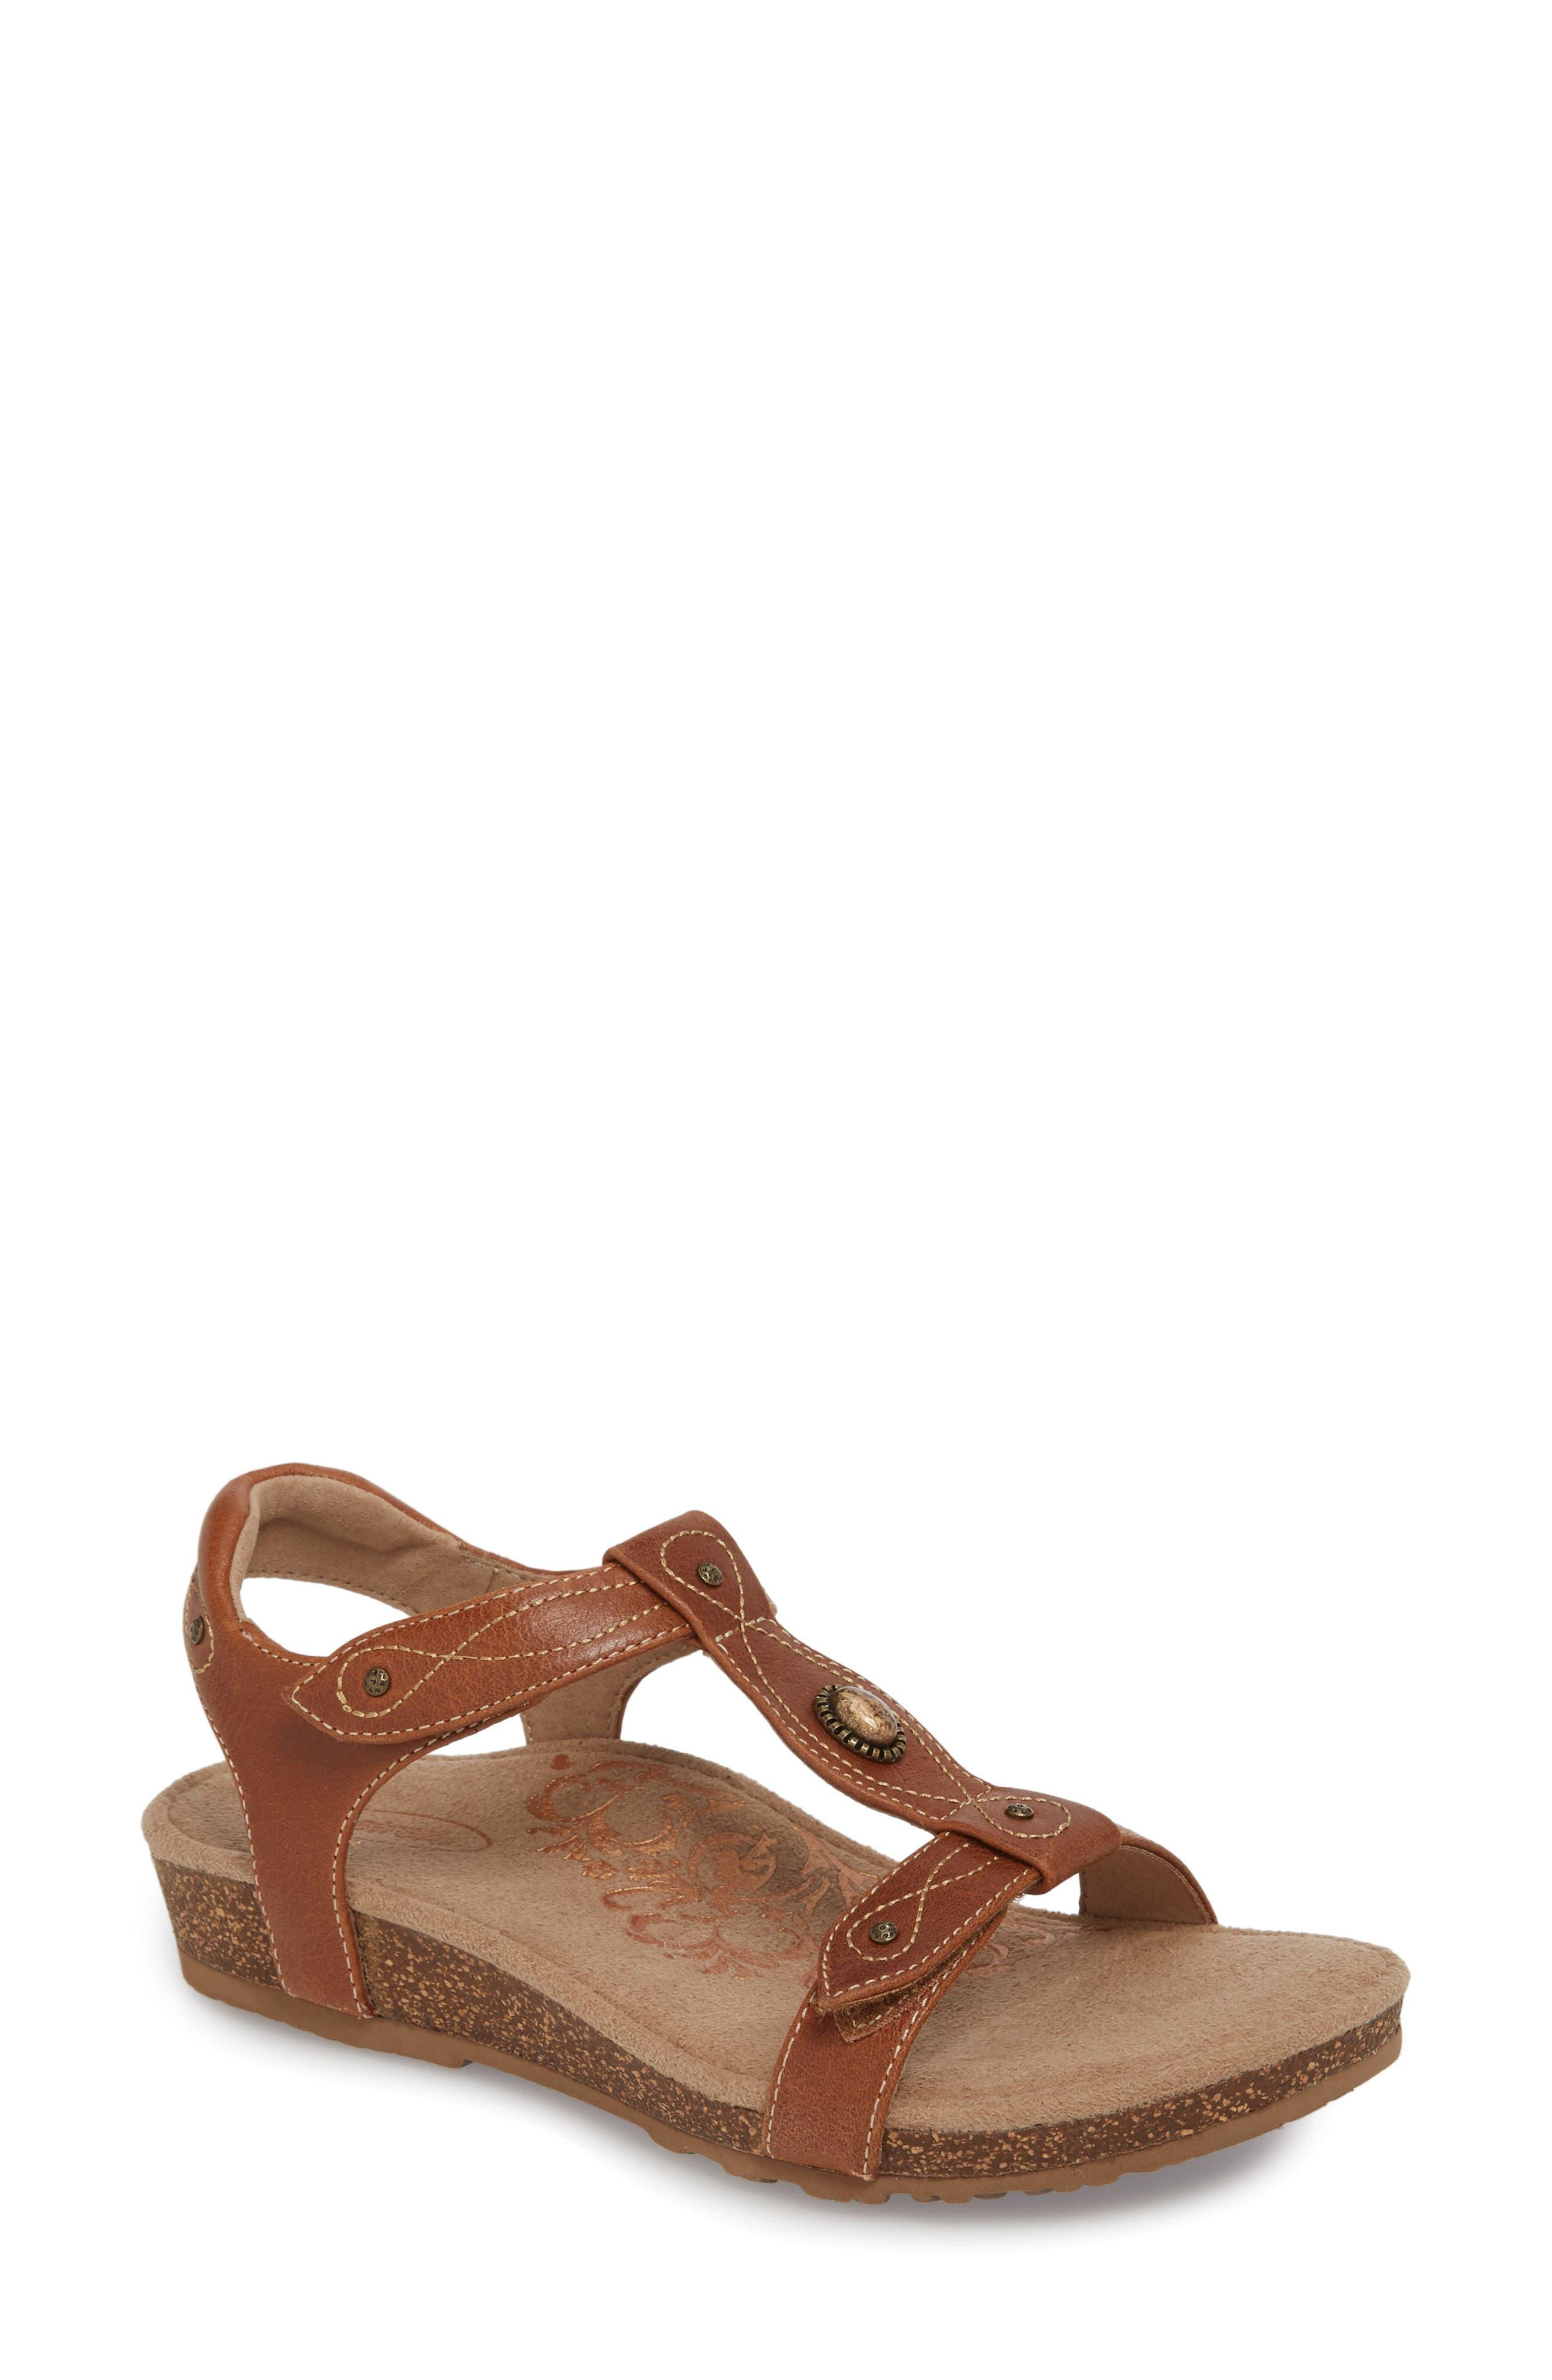 'Lori' Sandal,                             Main thumbnail 1, color,                             Cognac Leather